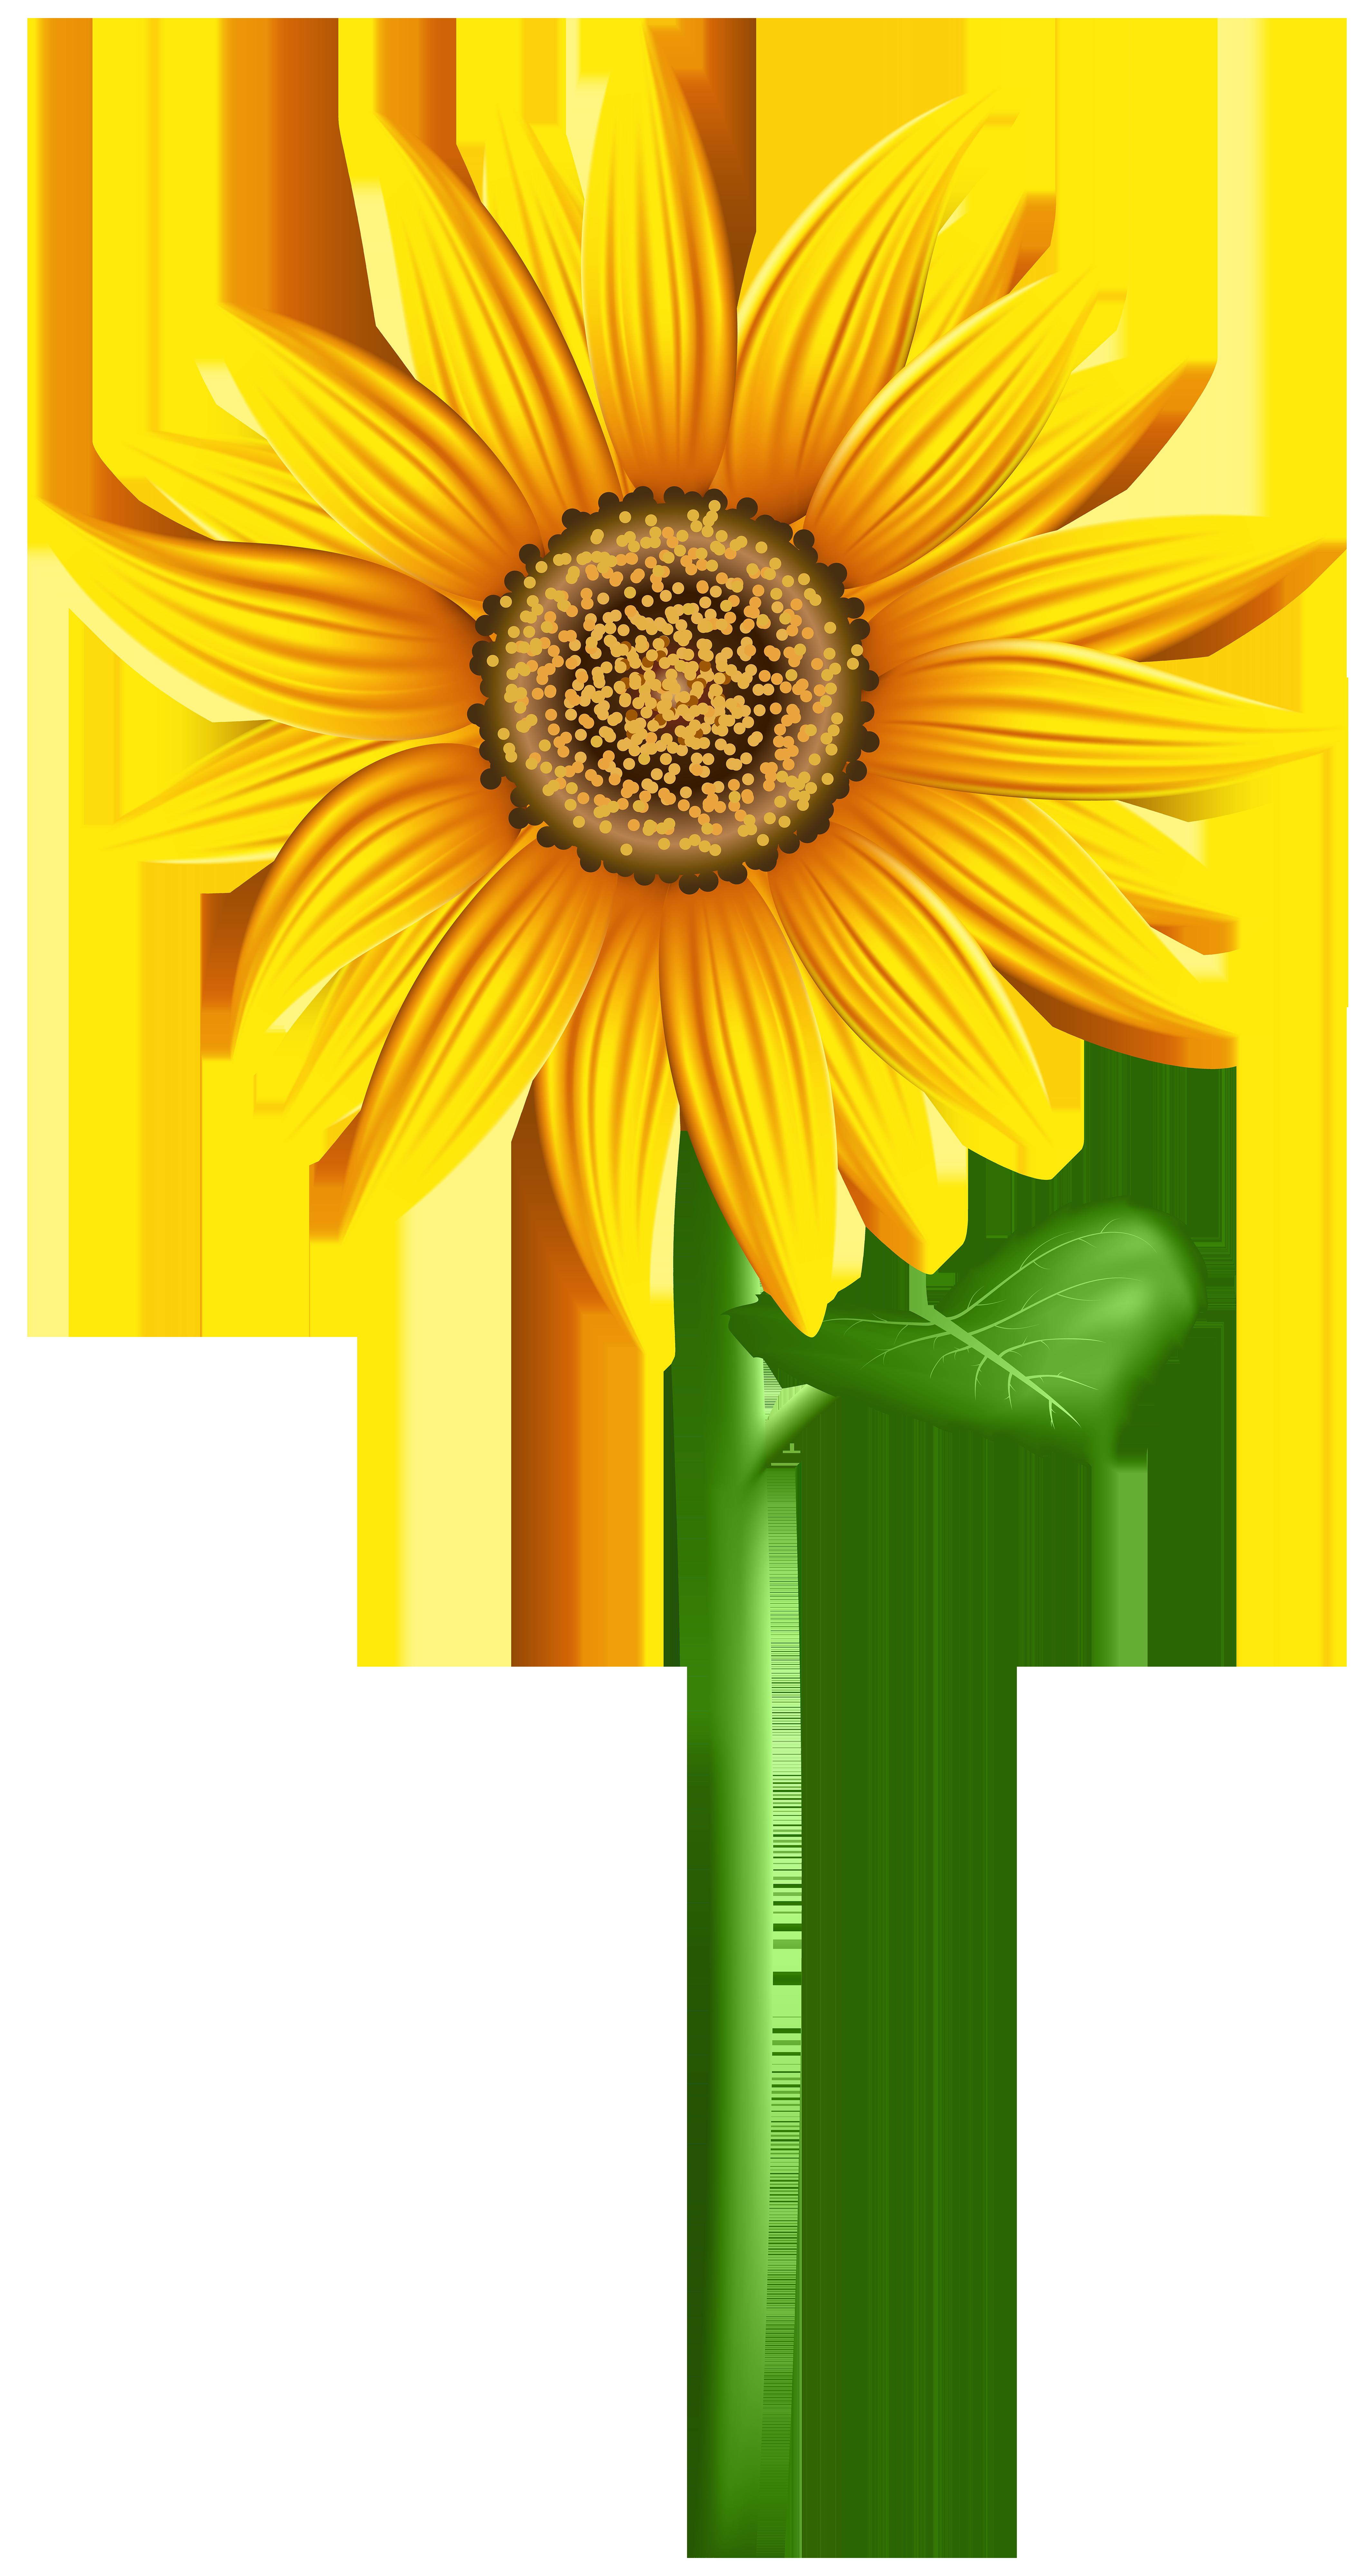 Sunflower PNG Transparent Clip Art Image.